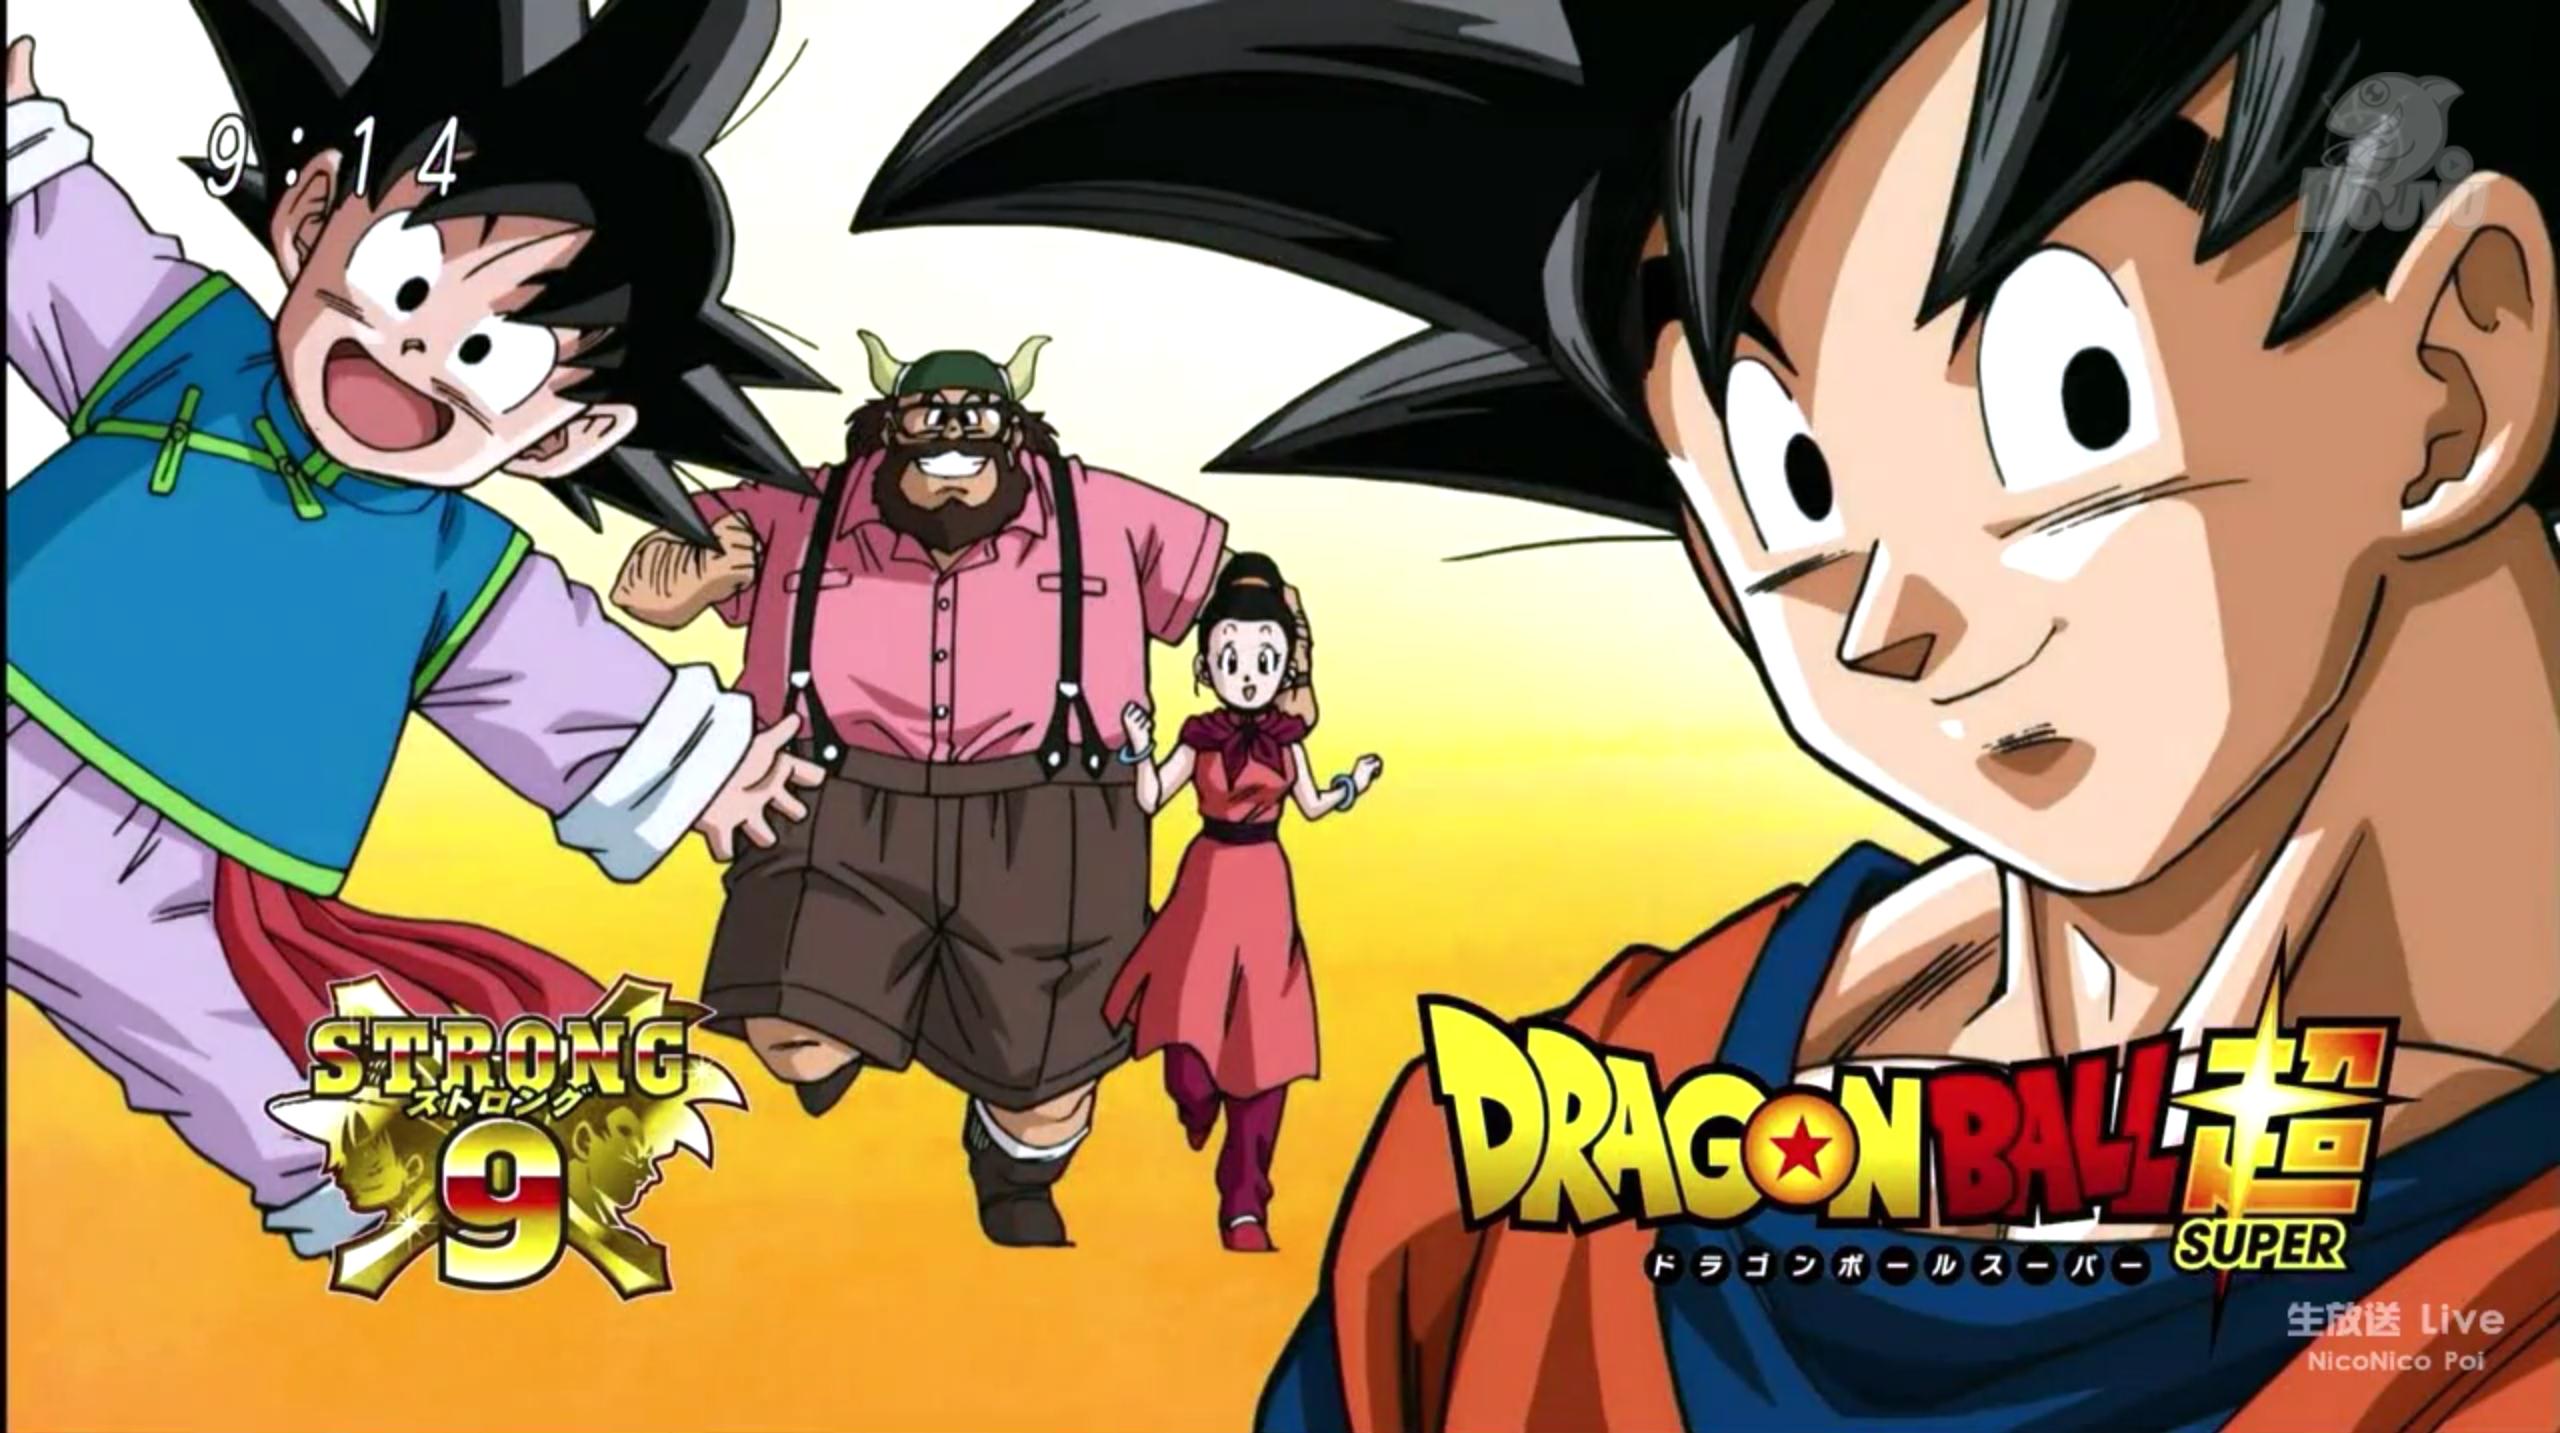 dragon ball super comic books pdf free download